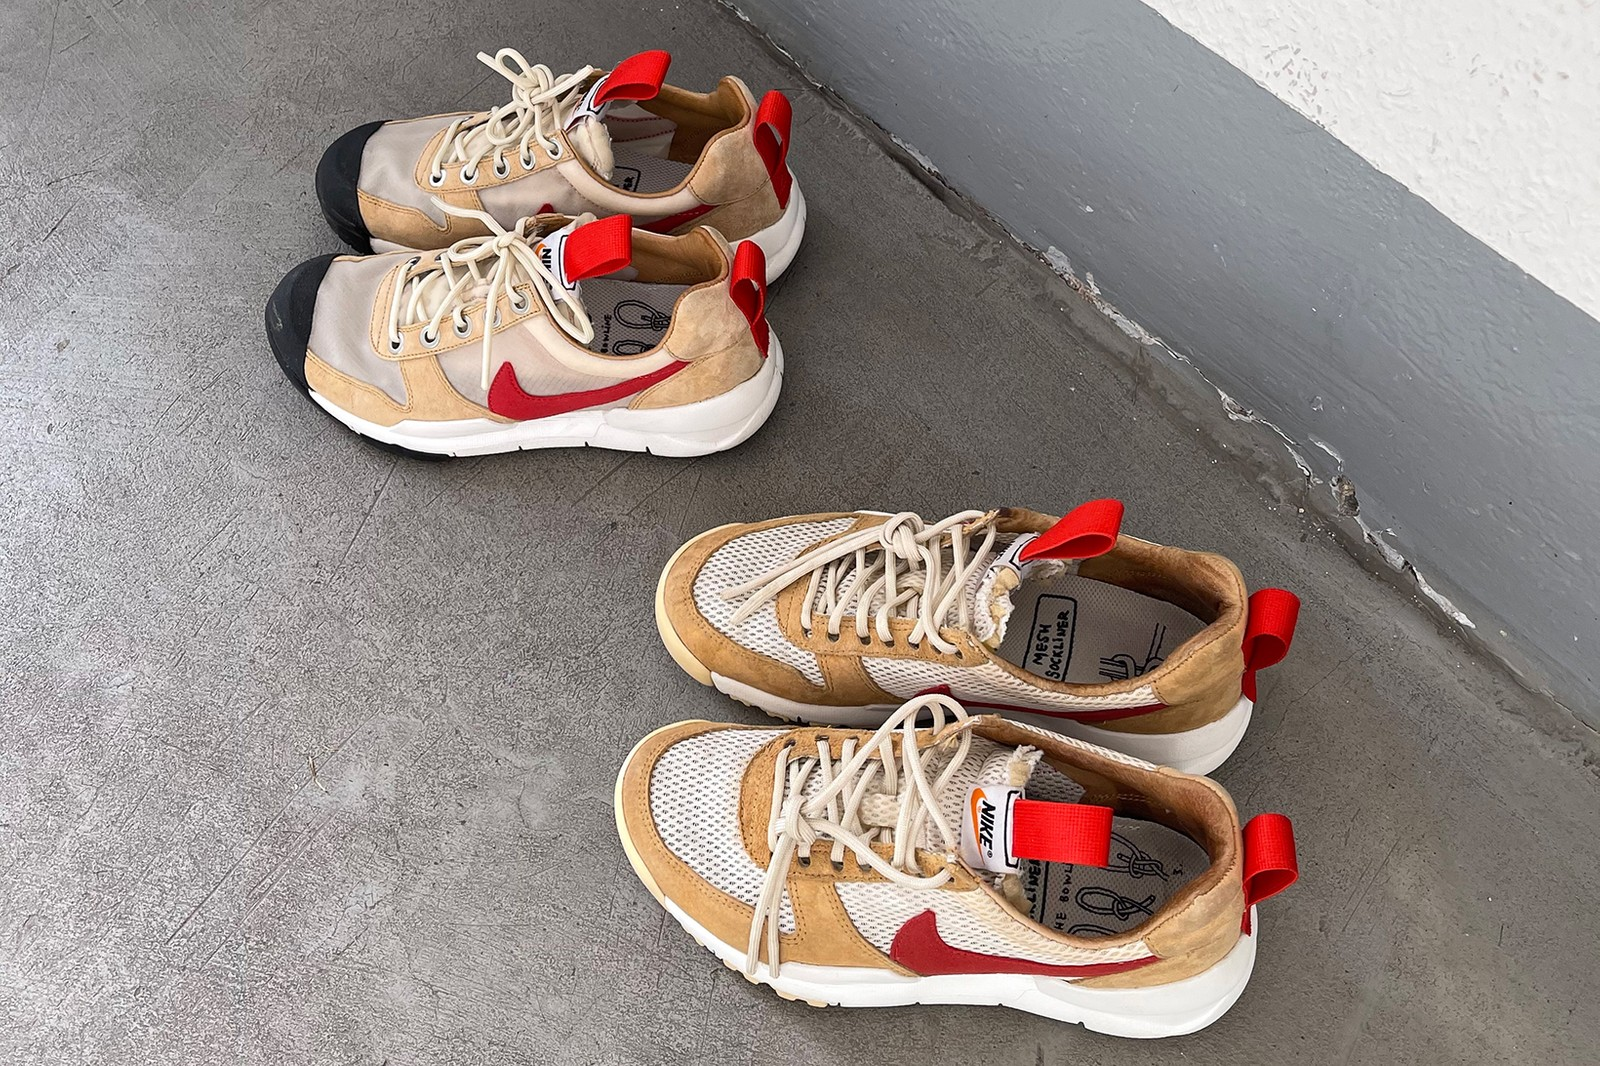 dani buck dj wideawakearthquake sneaker collector collection berlin germany content creator nike air jordan 1 sacai yeezy adidas